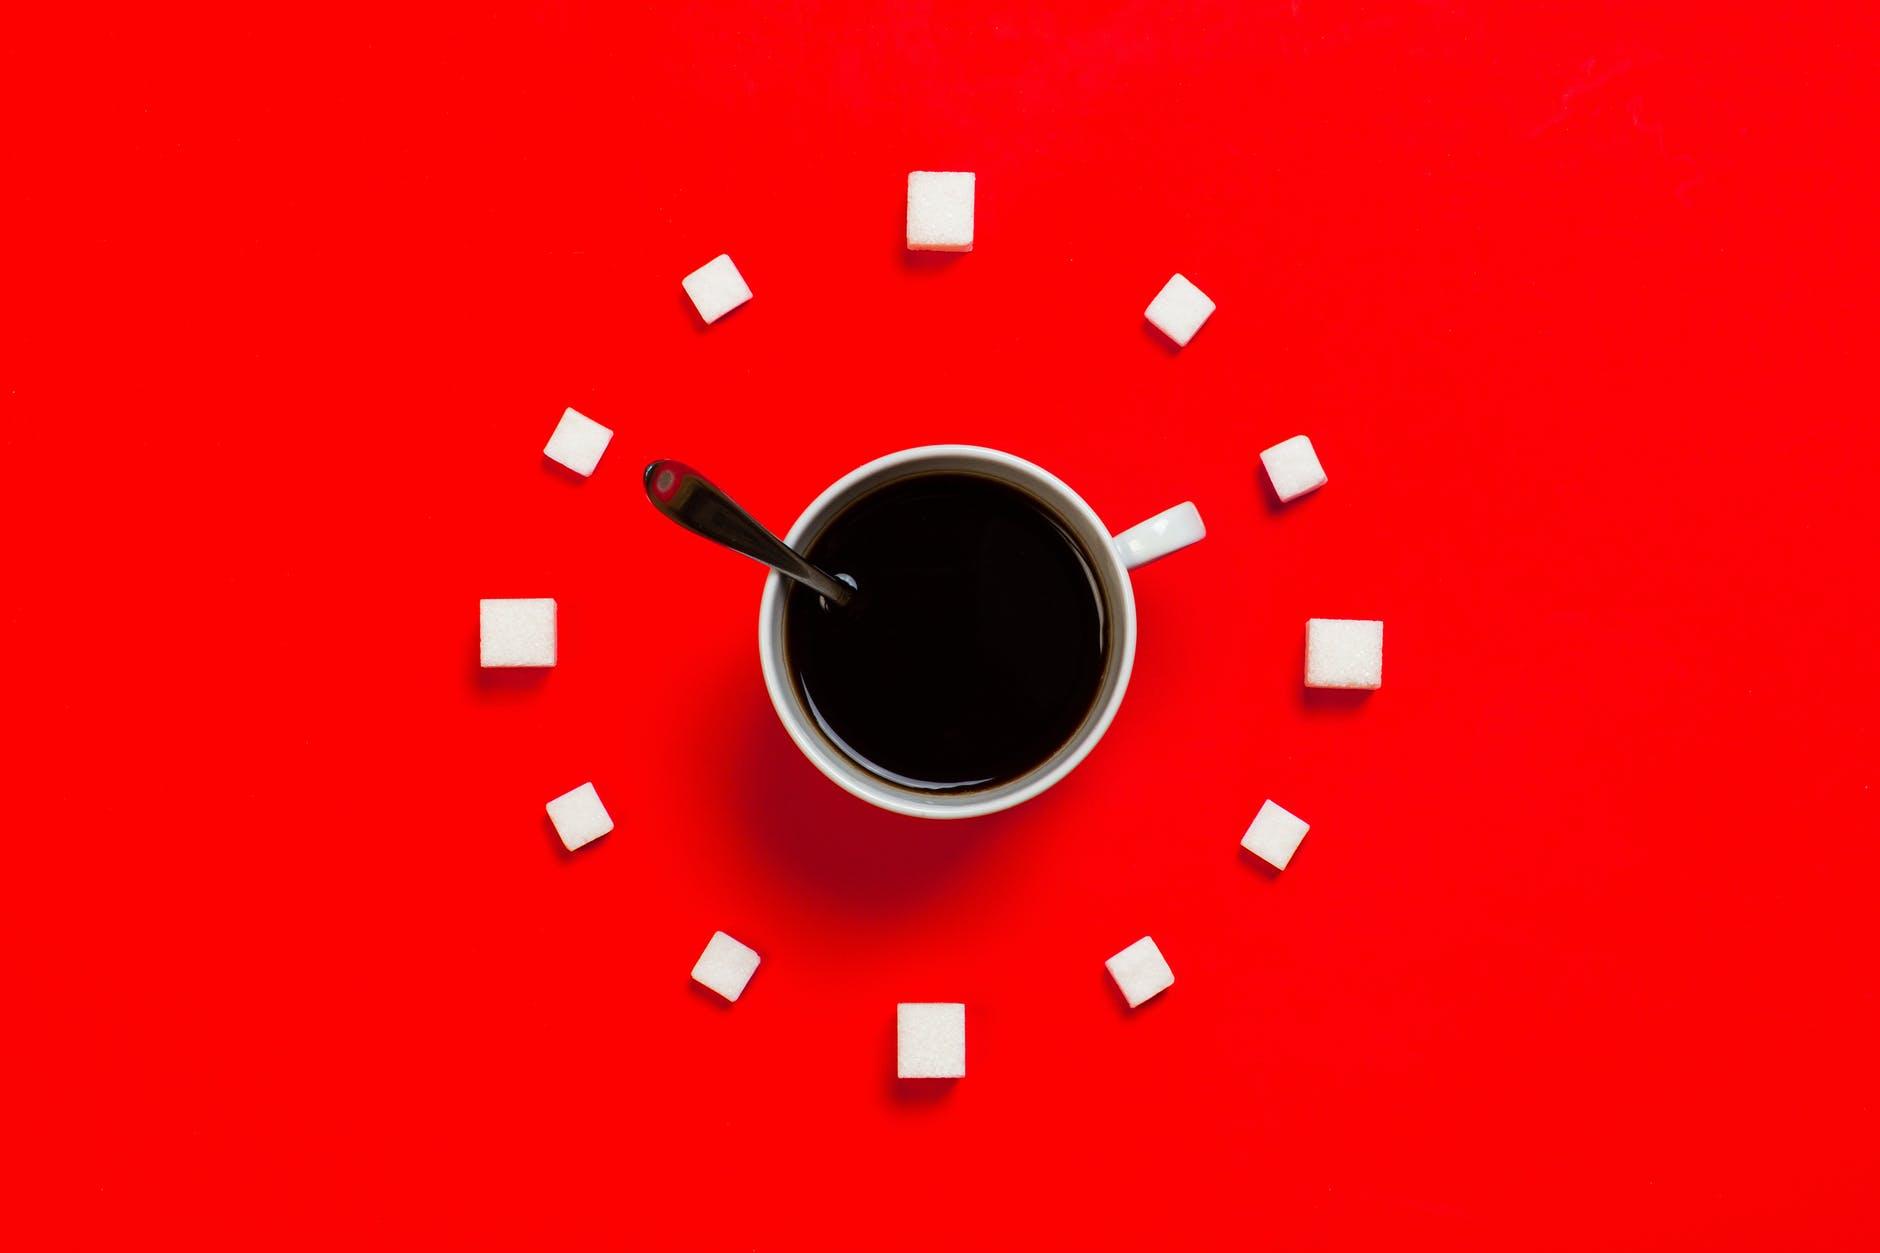 Coffee cup clock face